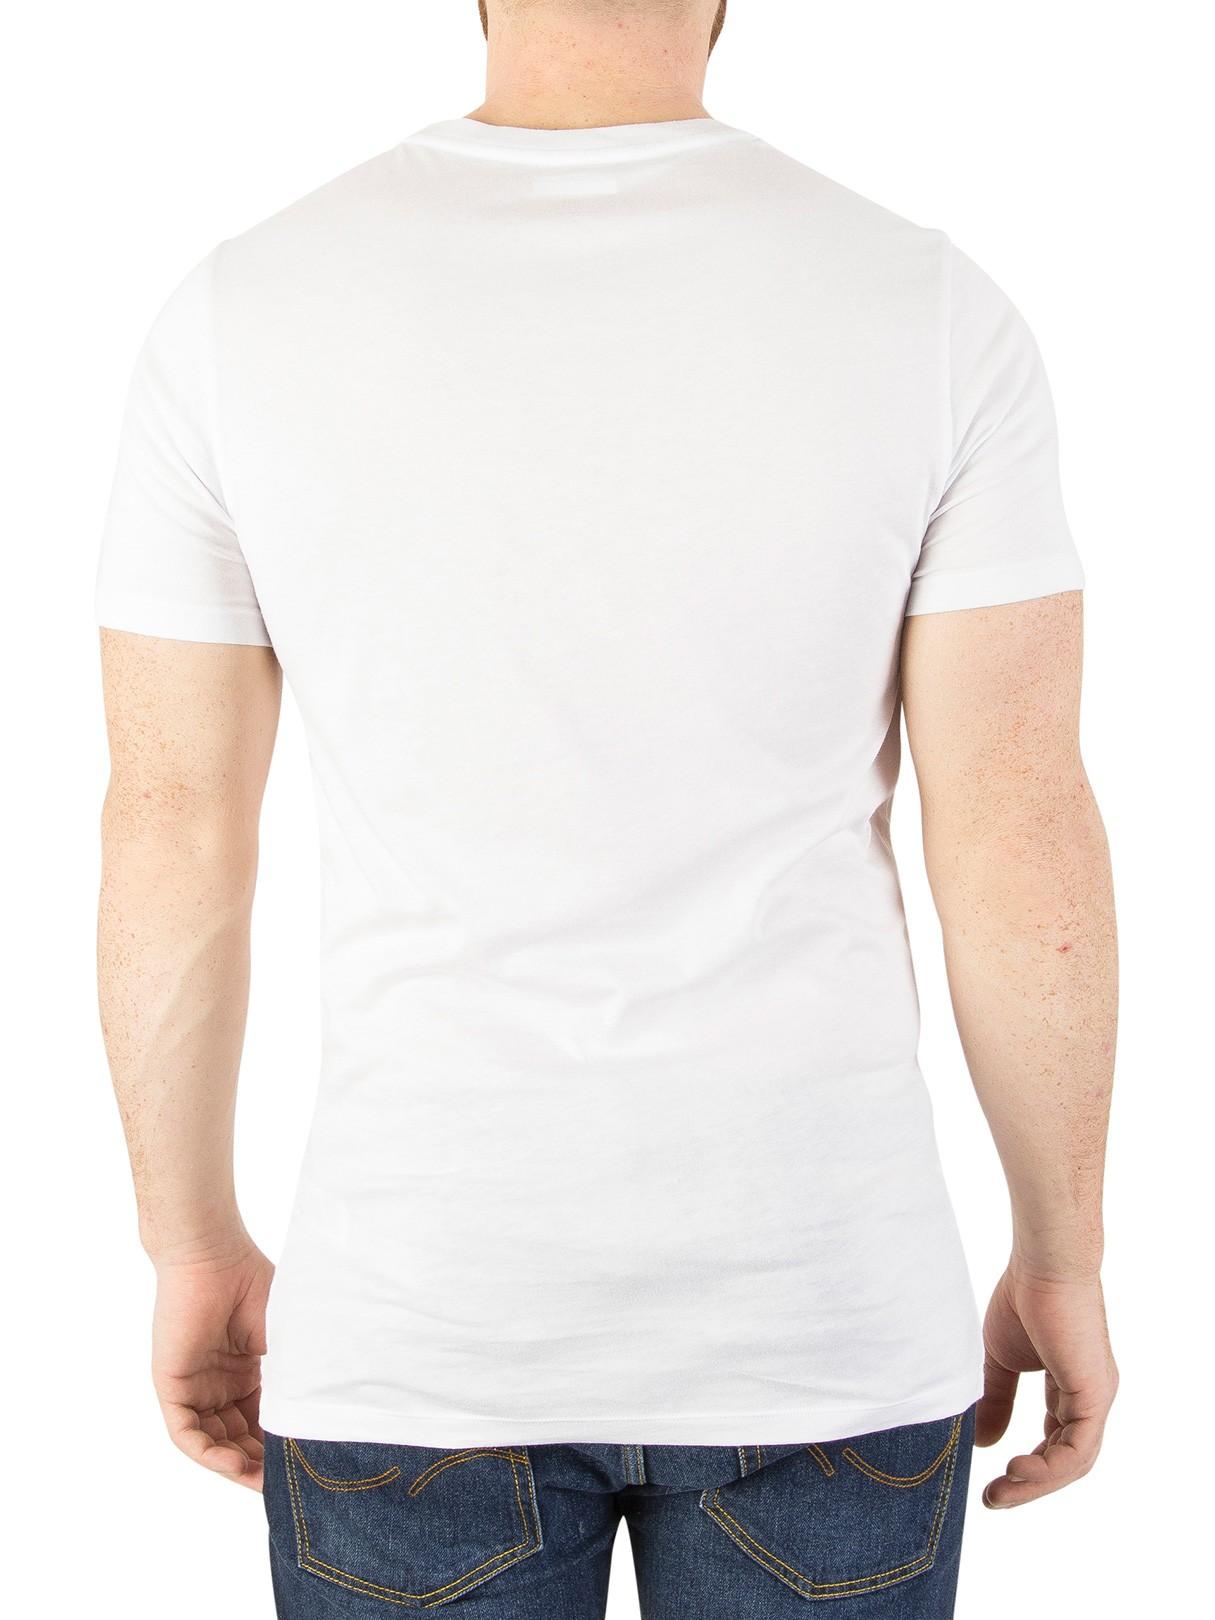 dd703d2a63b57 Slim ShirtsStandout Lacoste Fit T Pack White 3 1uJ5TFc3lK